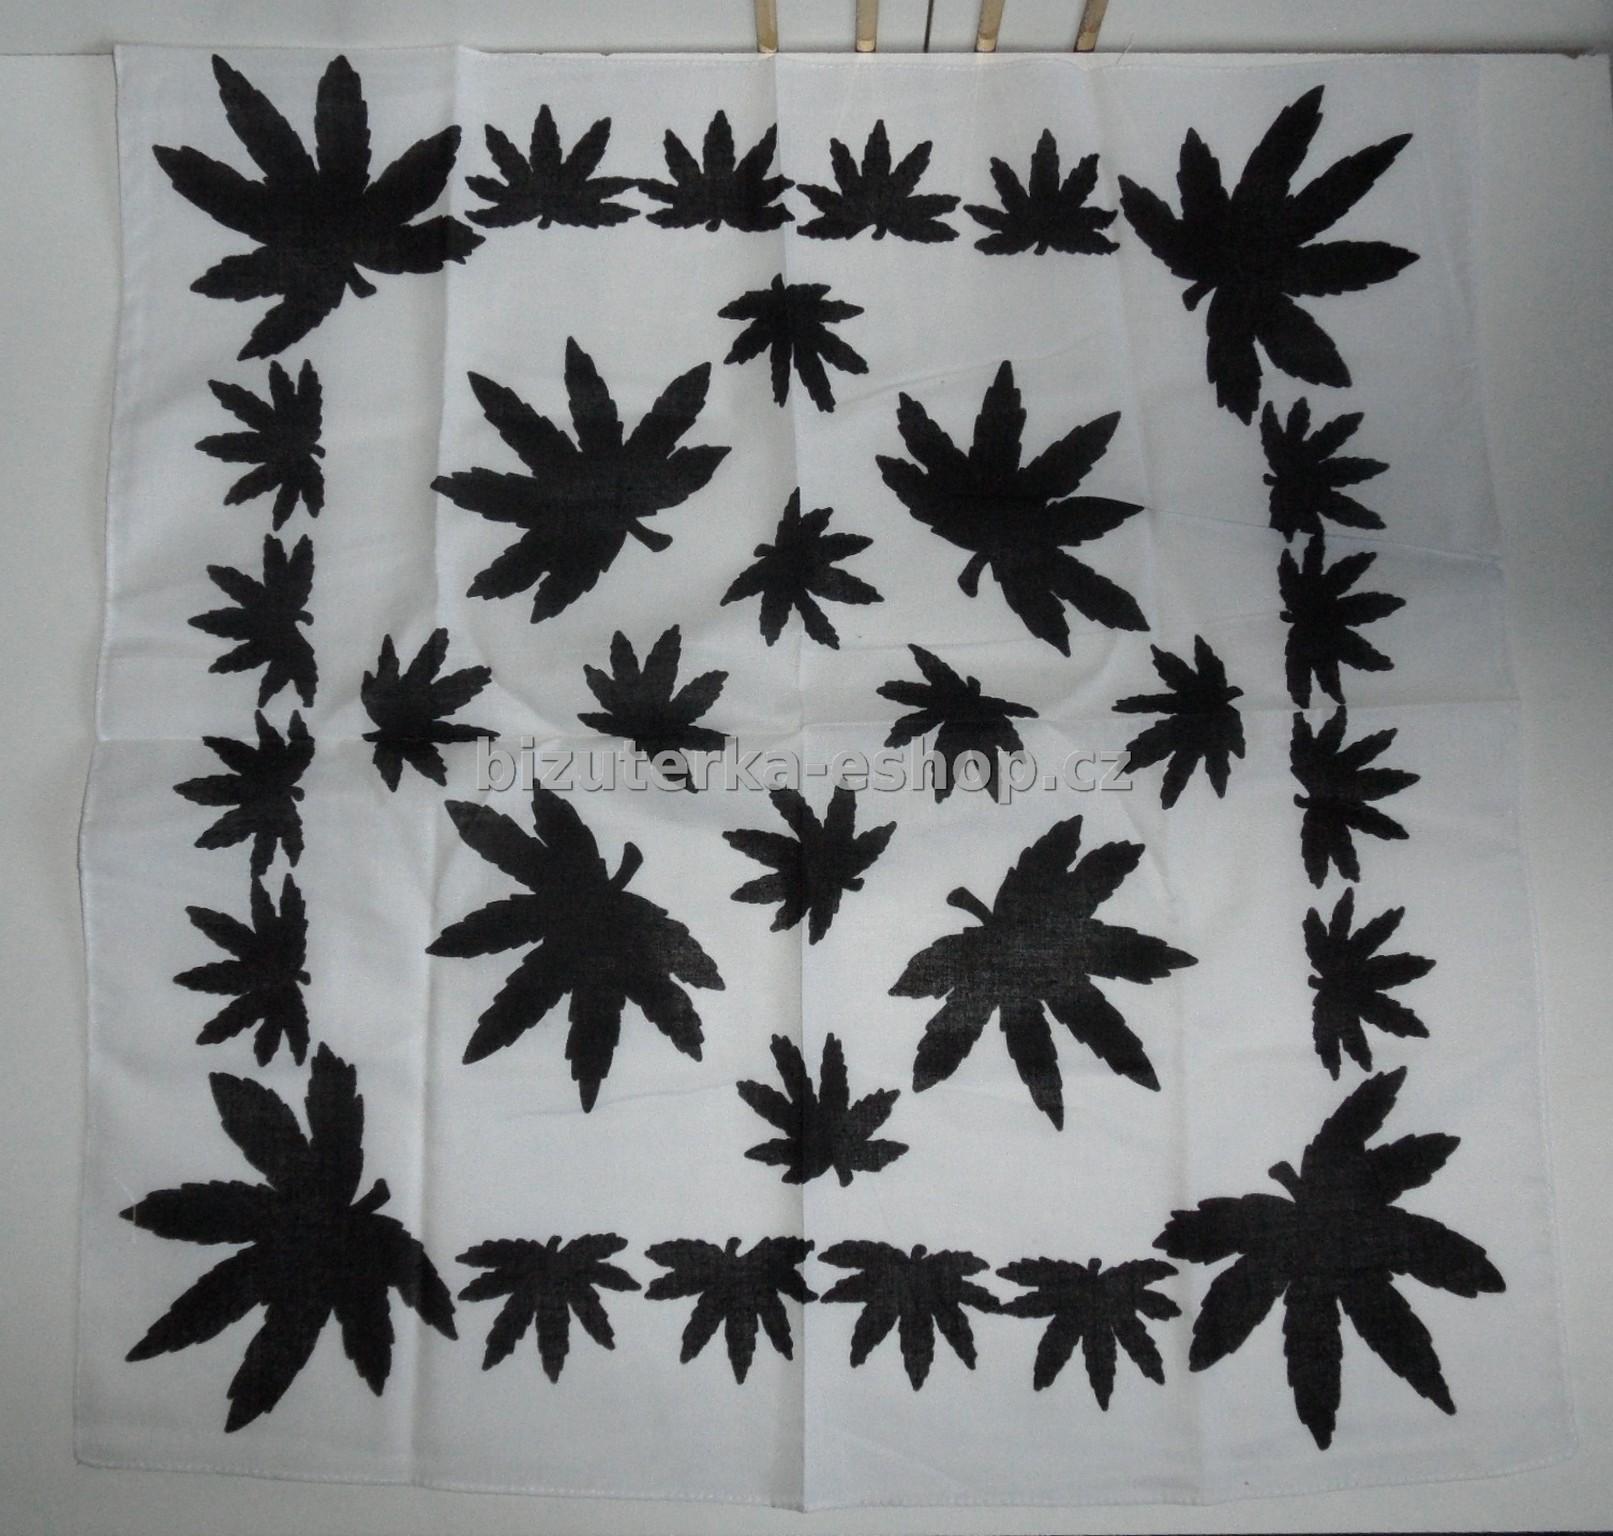 Šátek marihuana bílo černý BZ-03264 7c76e0c3e2